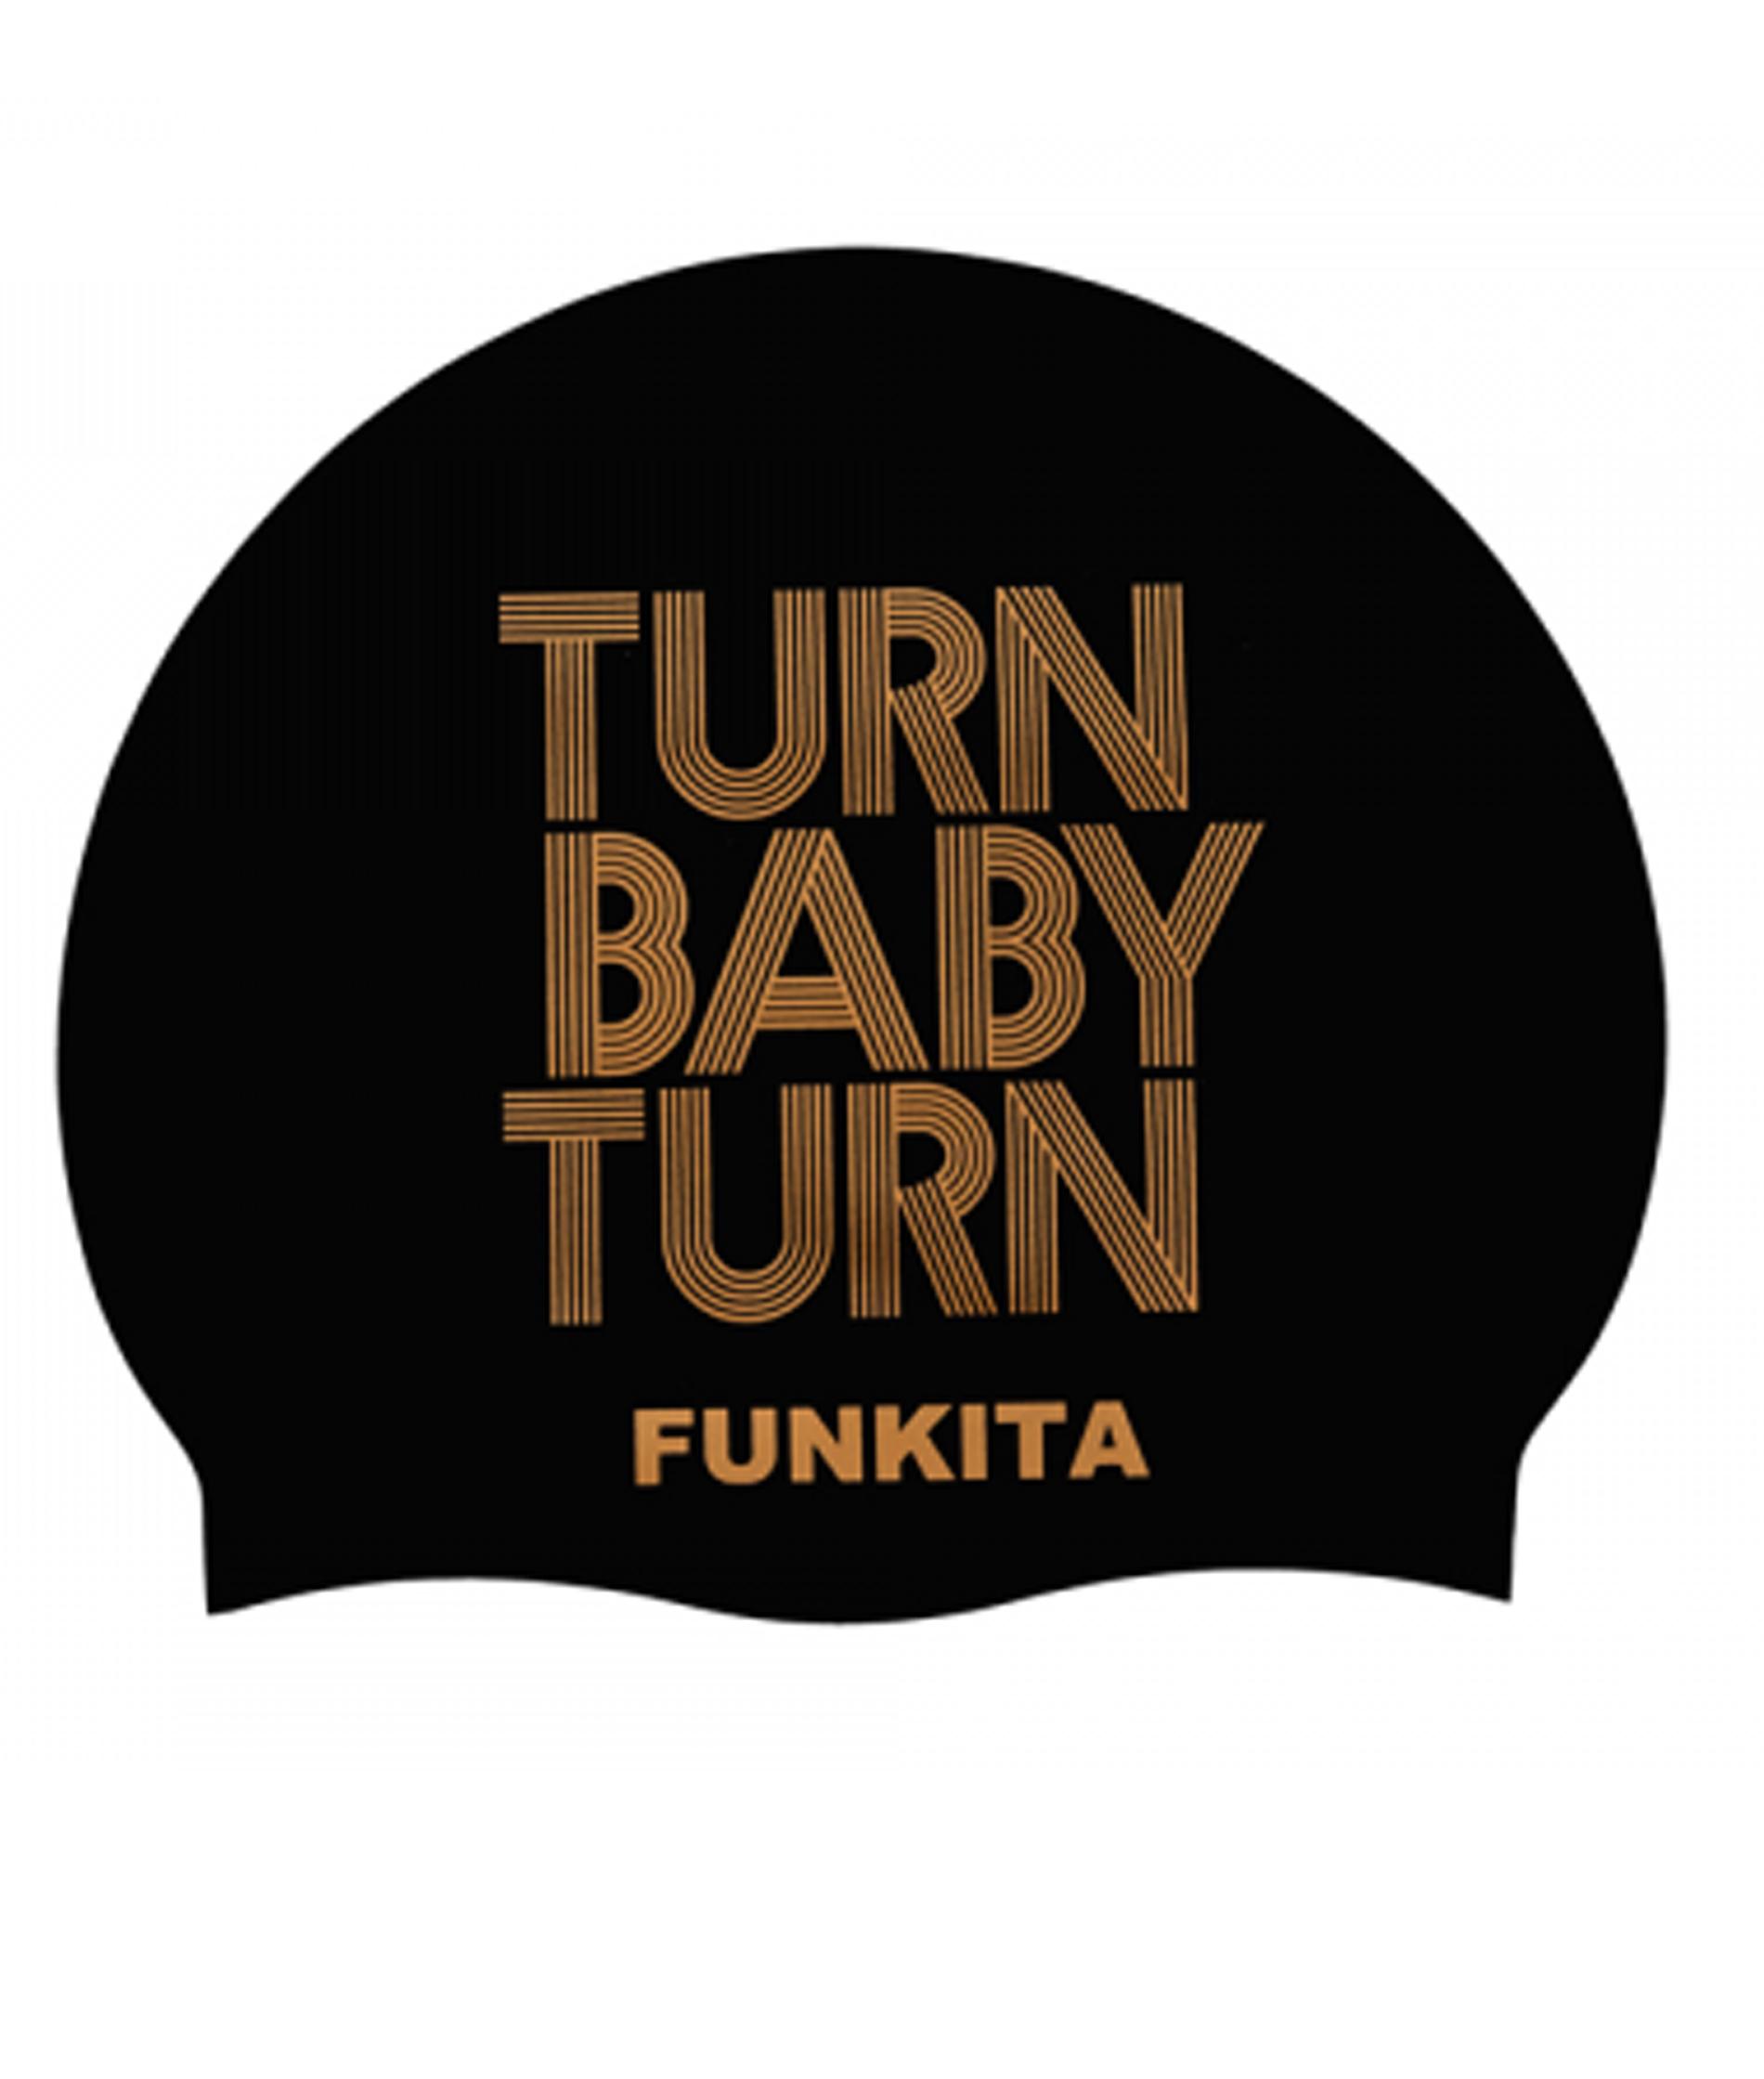 Funkita Turn Baby Turn Swim Cap